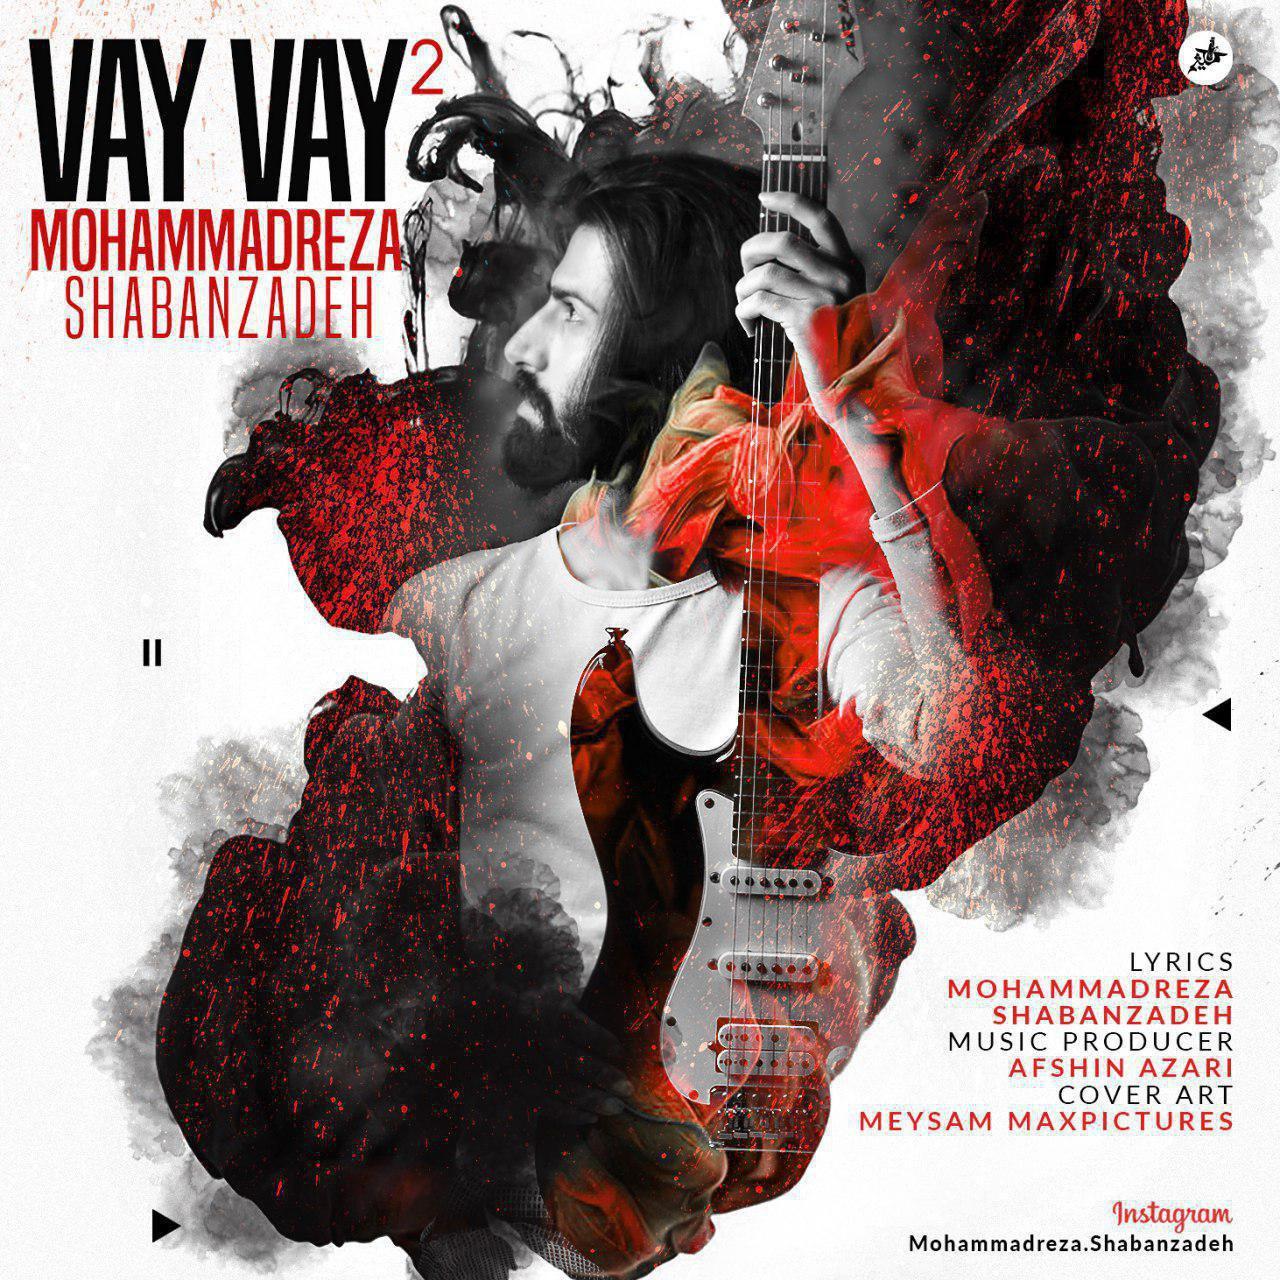 Mohammad Reza Shabanzadeh - Vay Vay (New Version) Music   آهنگ محمدرضاشعبانزاده - وای وای